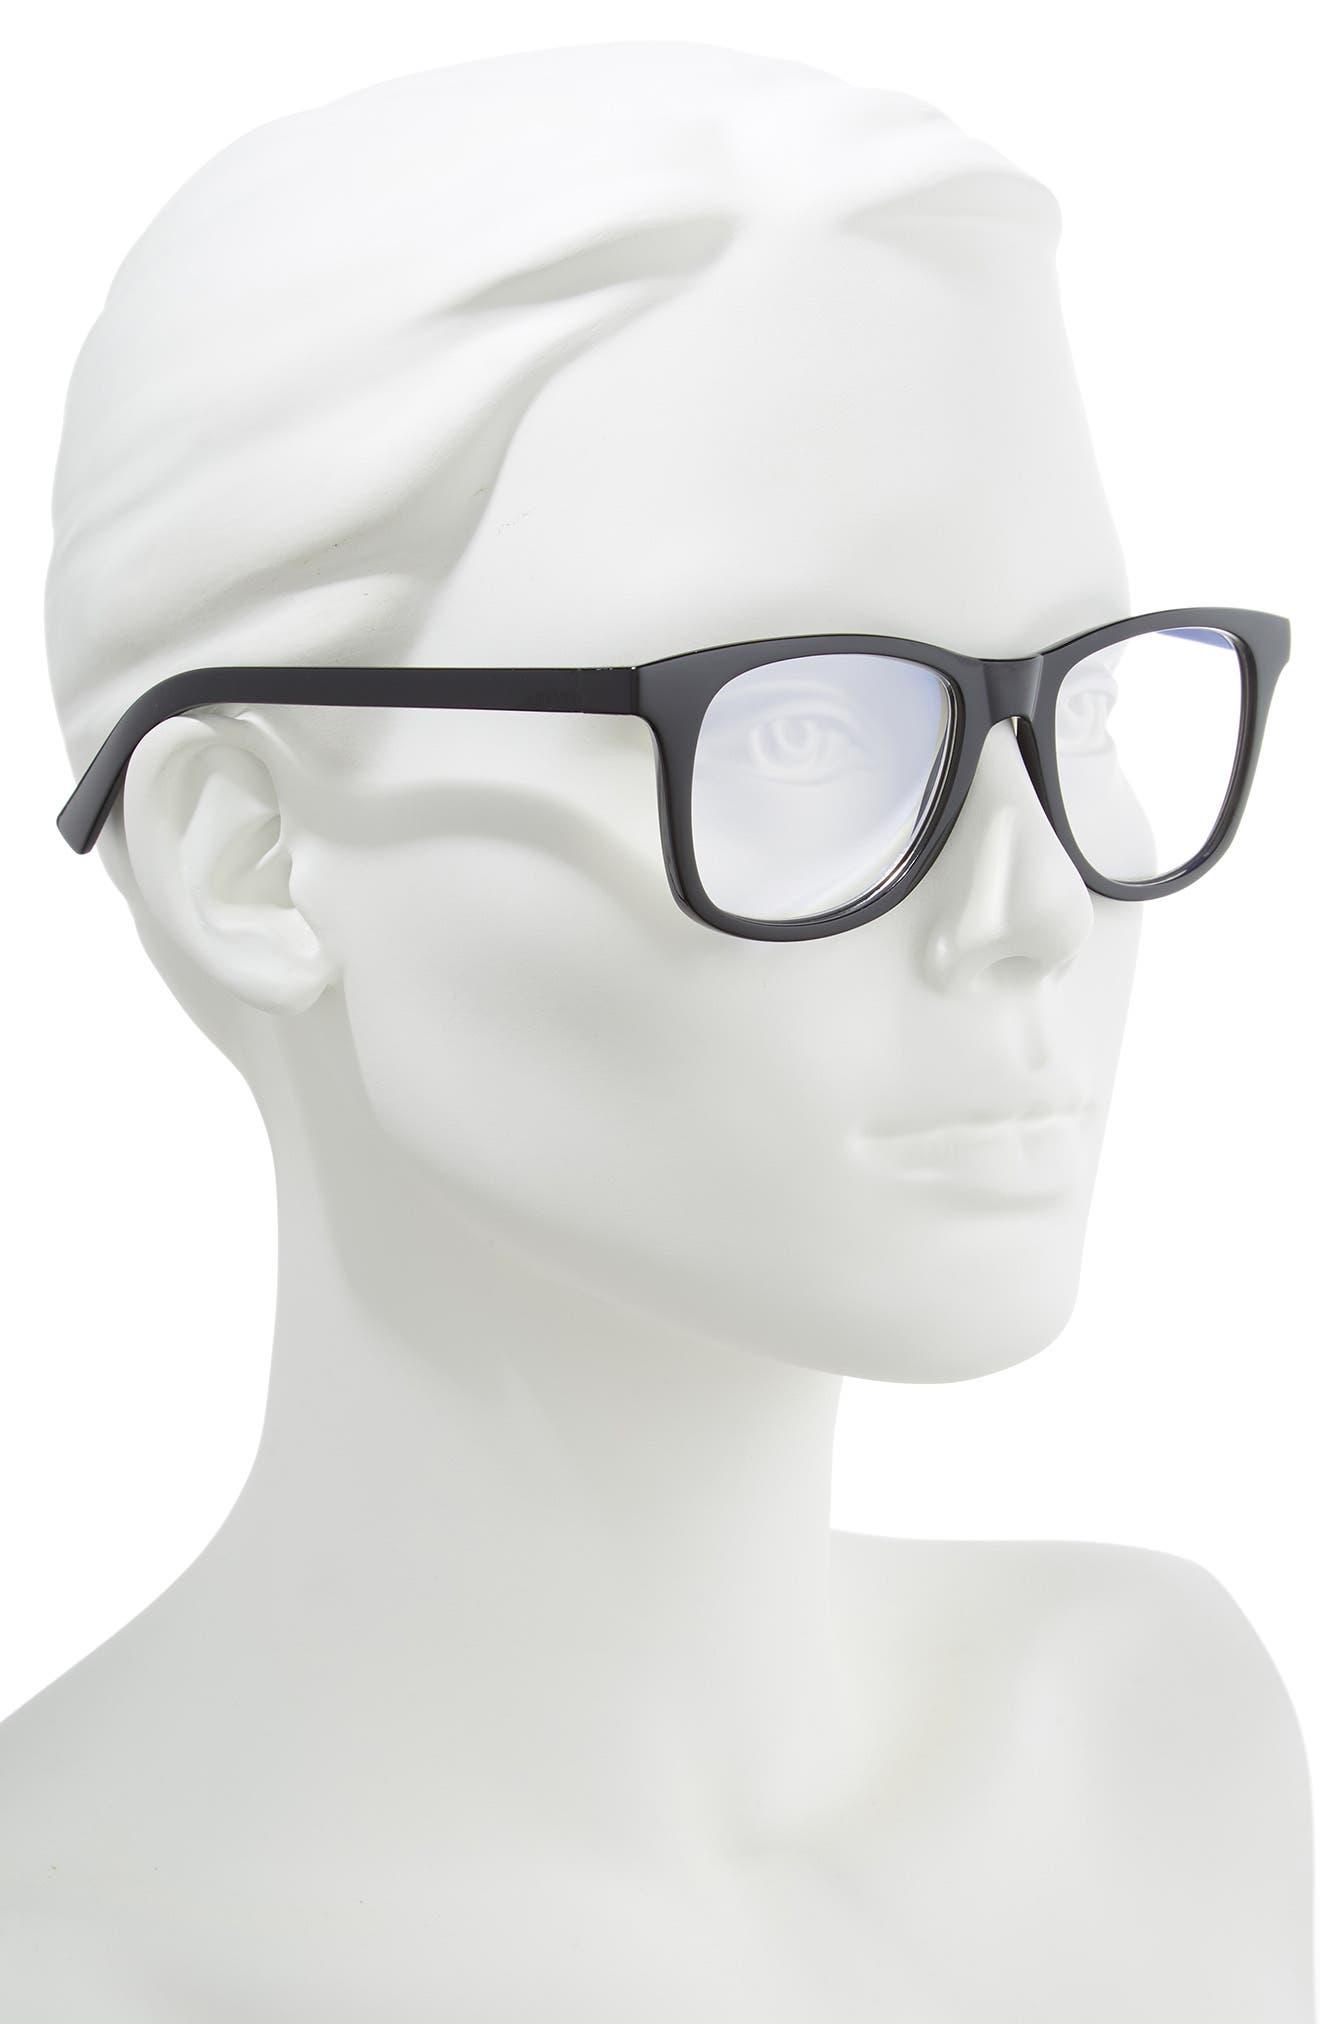 Grime in Banishment 52mm Reading Glasses,                             Alternate thumbnail 2, color,                             BLACK